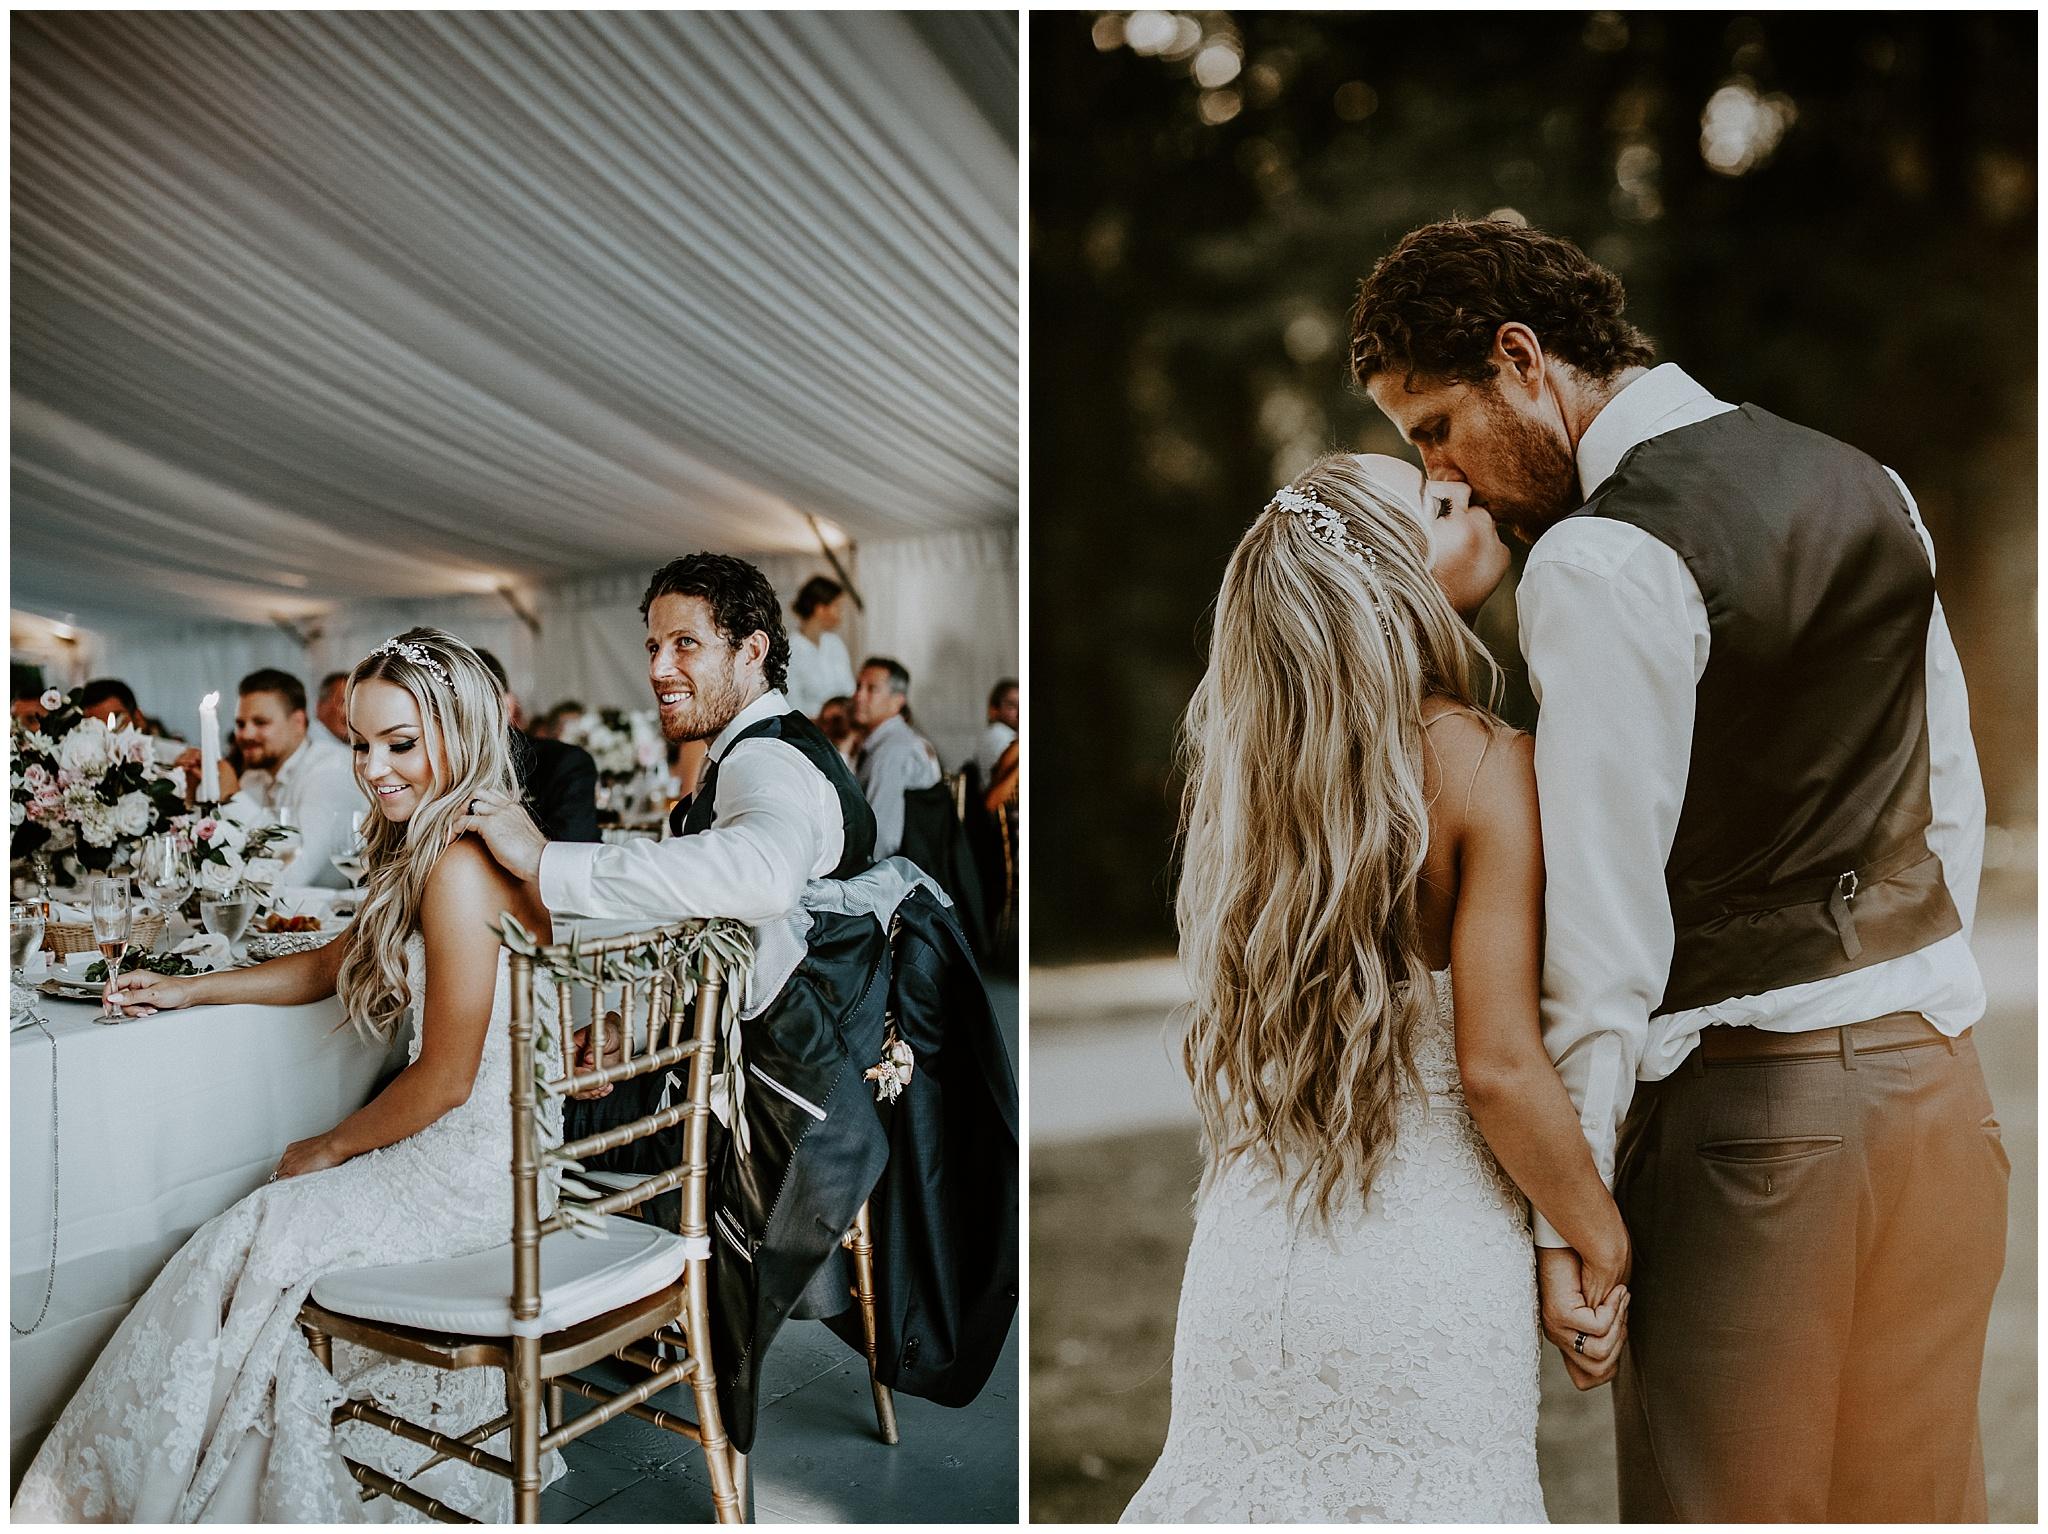 hart-house-vancouver-wedding-brittandkyle-022.JPG